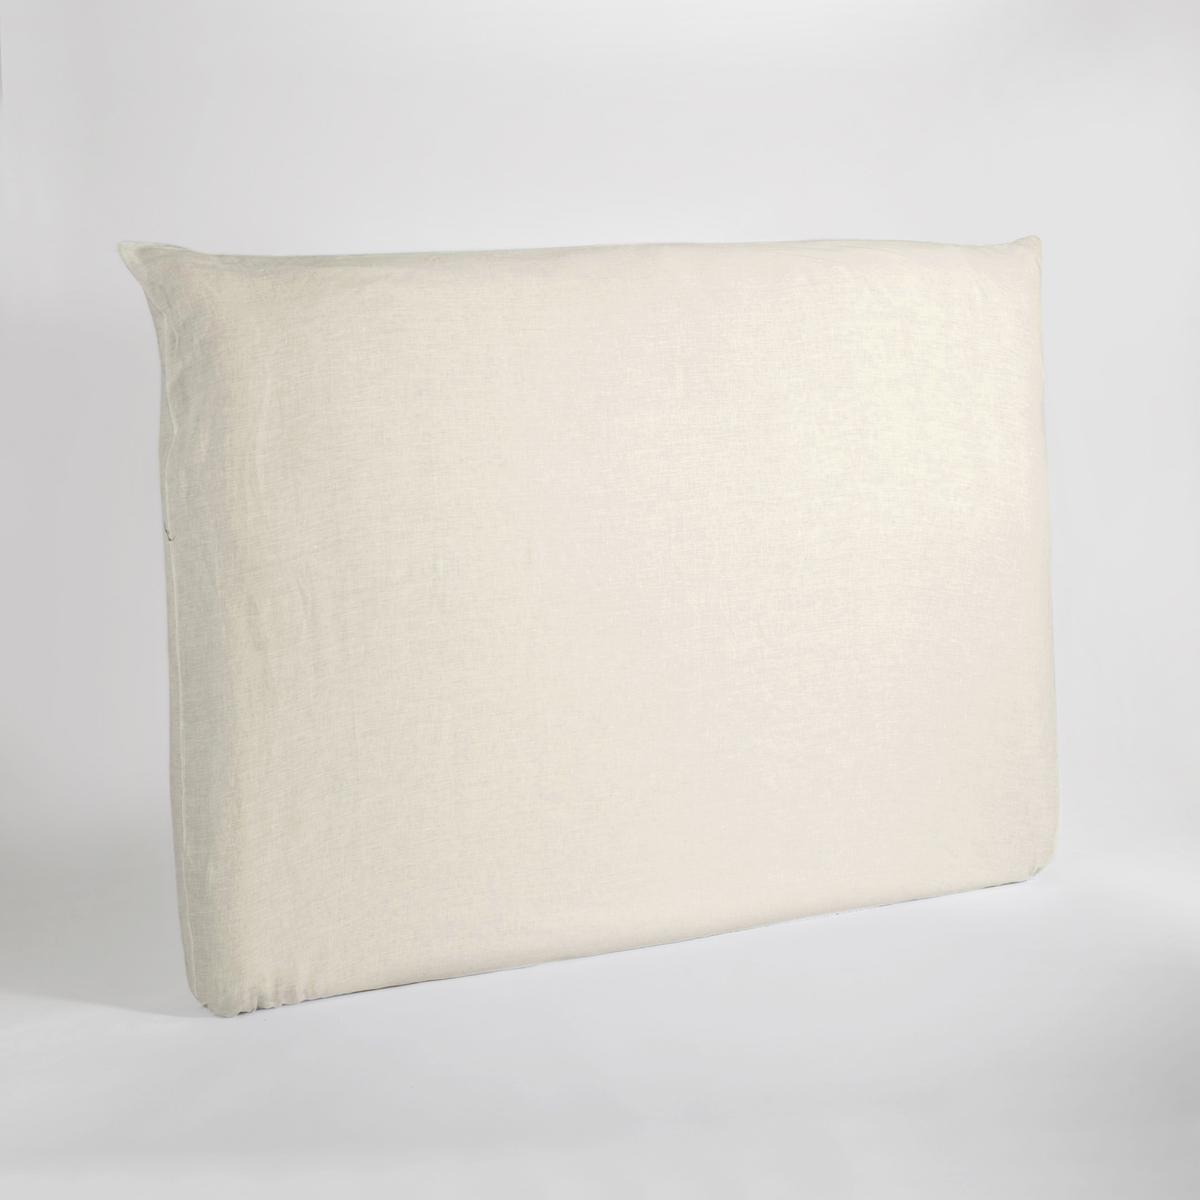 Чехол La Redoute На изголовье кровати из осветленного льна Mereson 160 см бежевый